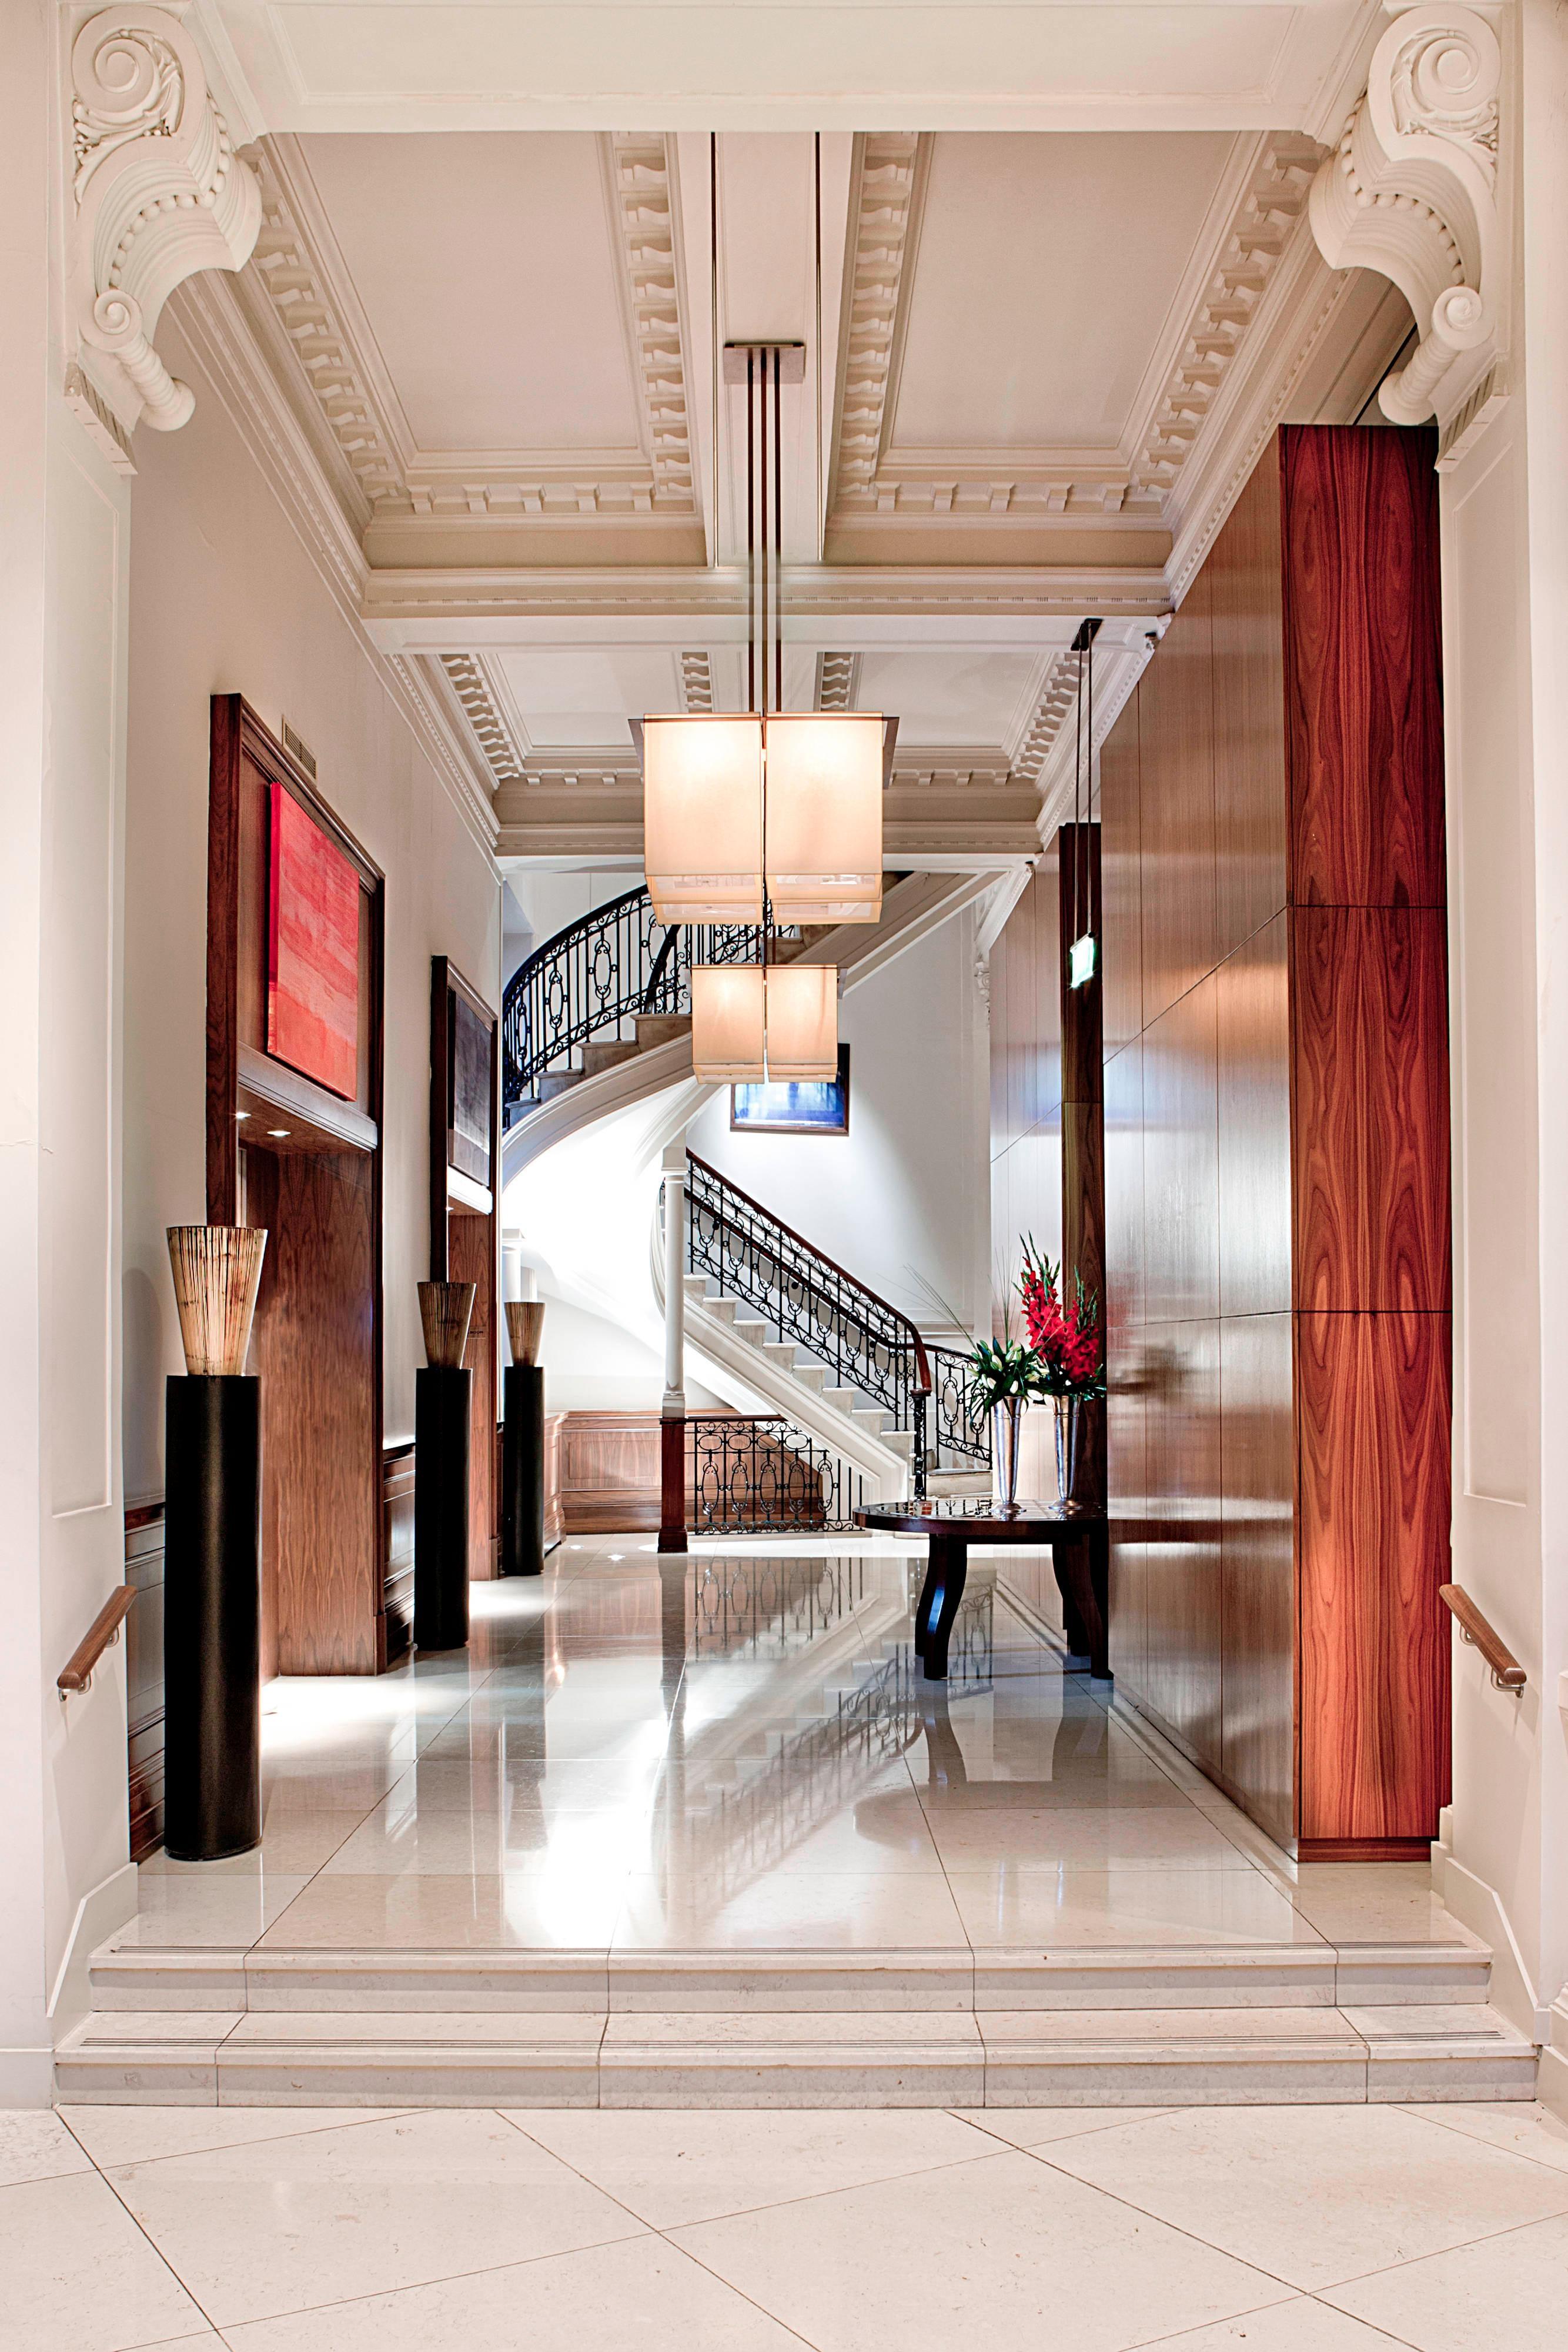 Luxus-Hotel in London